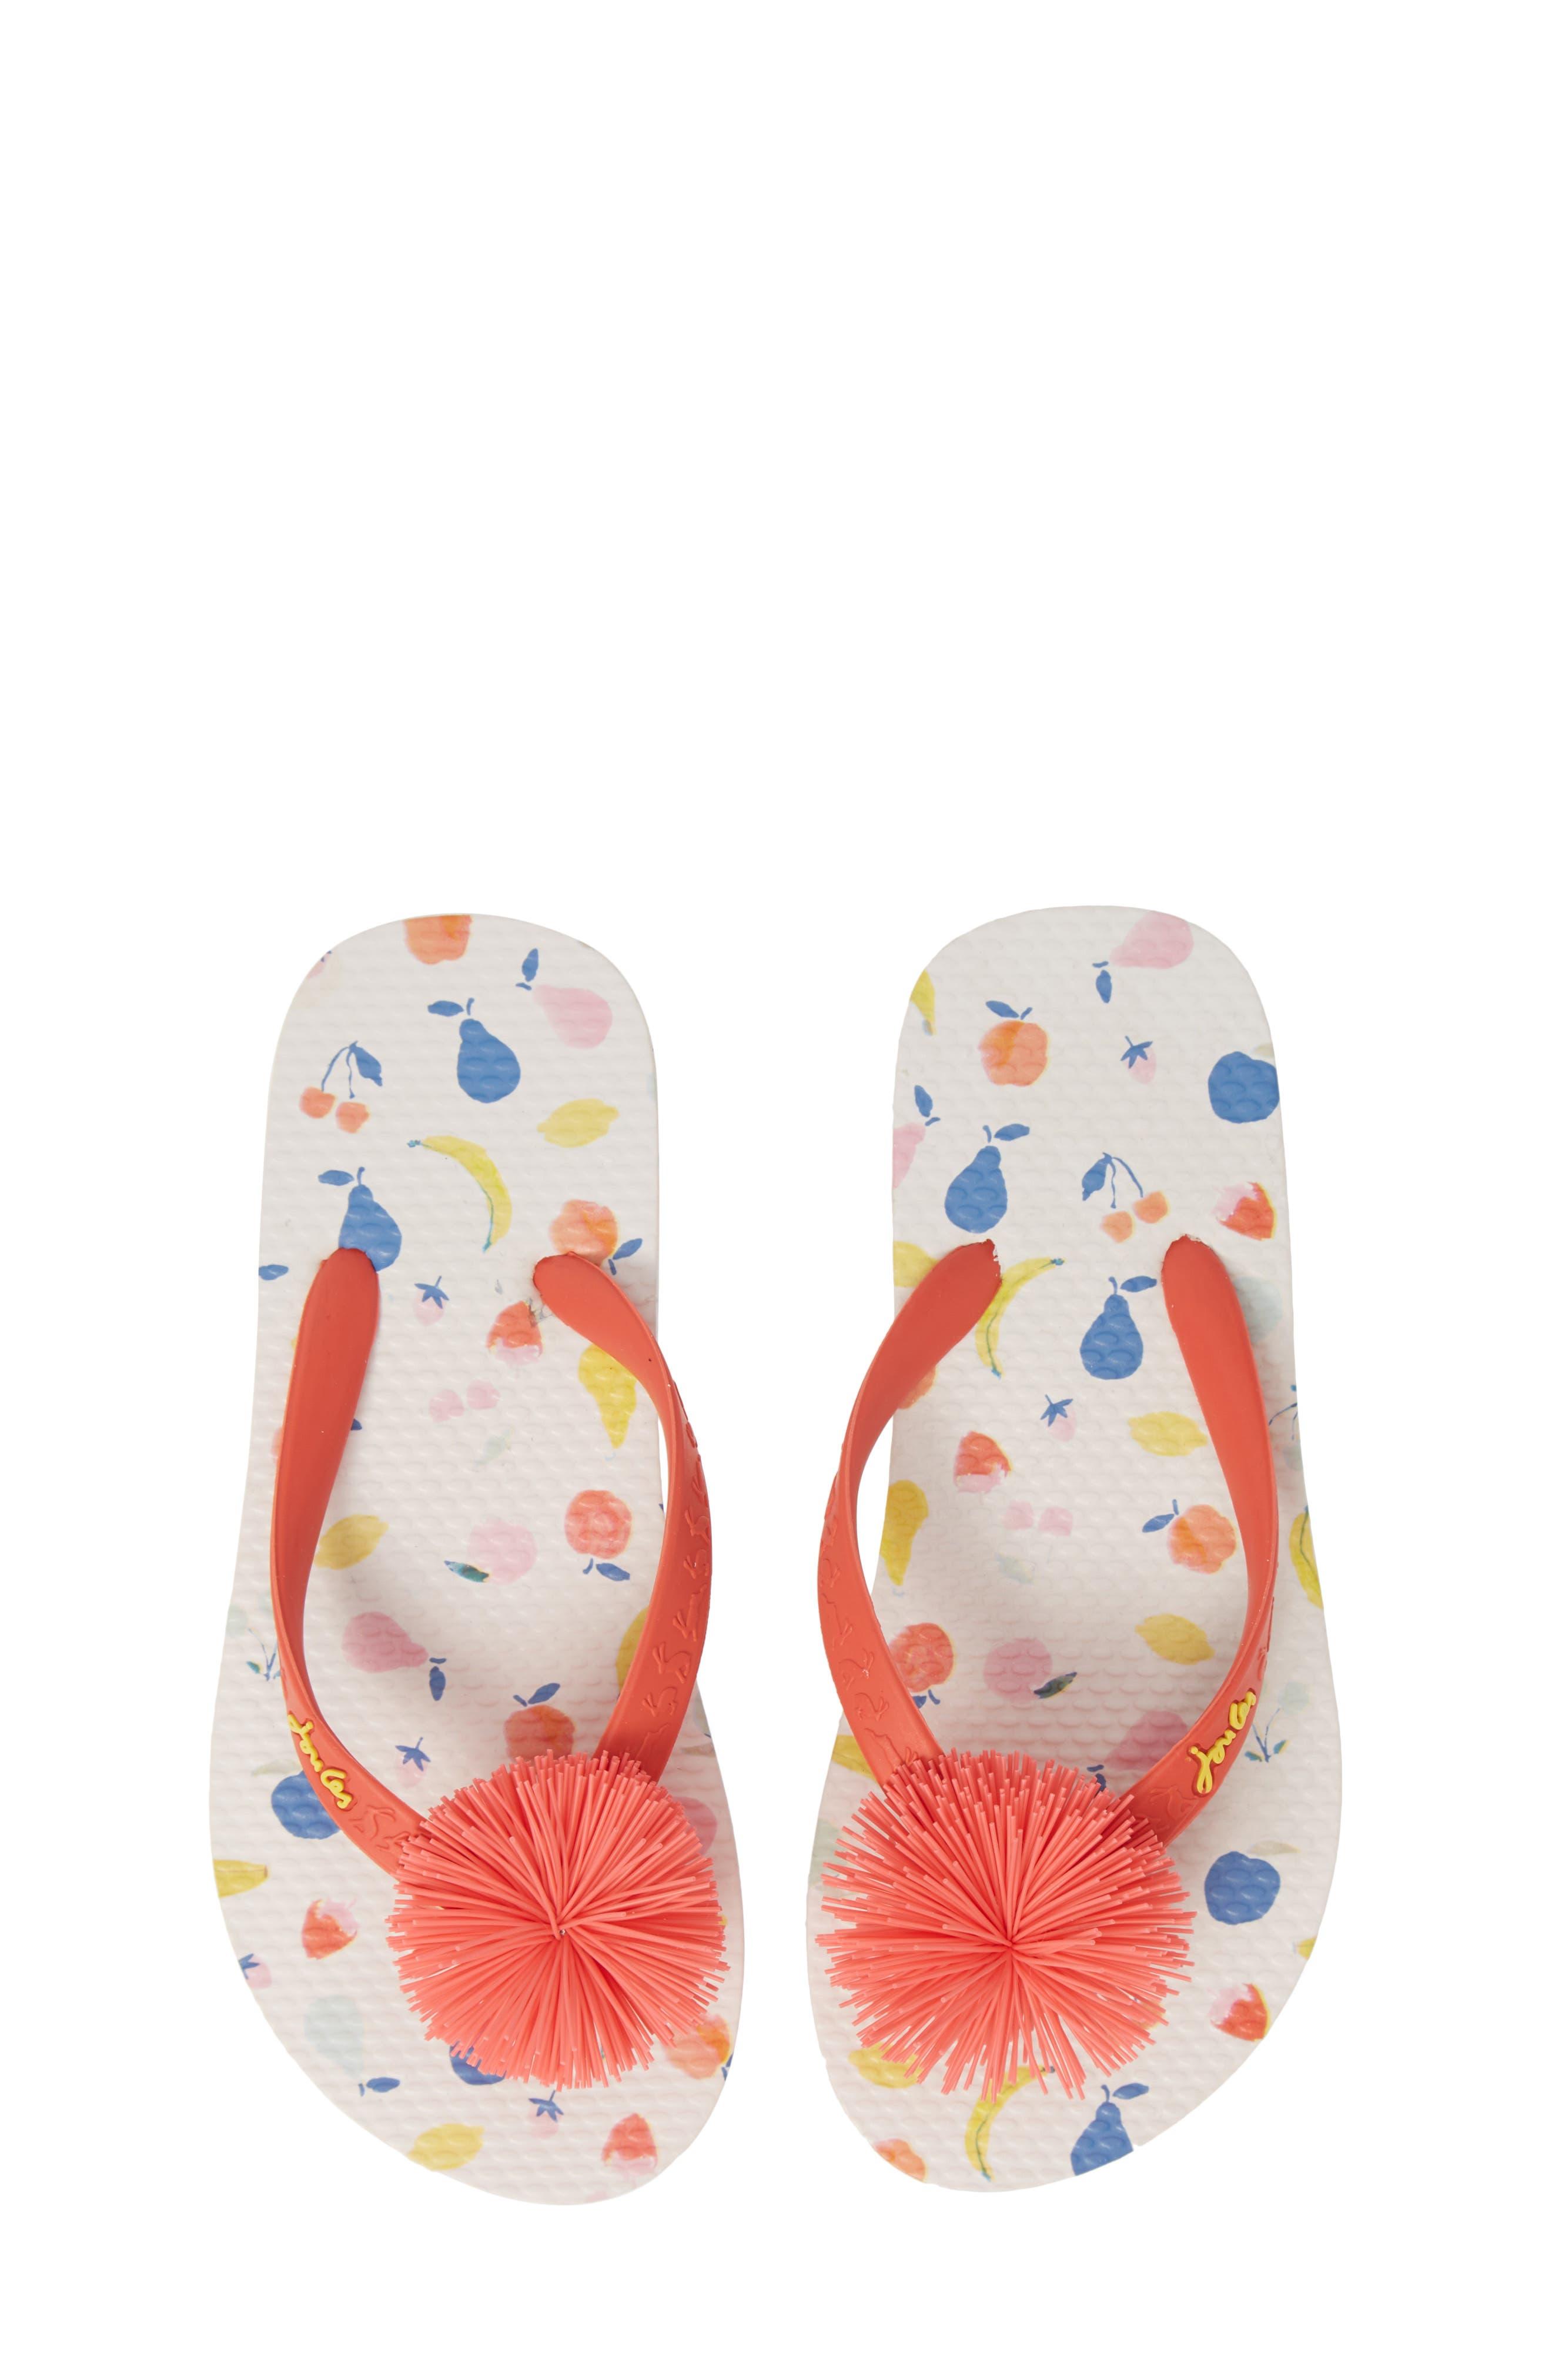 JOULES, Embellished Flip Flop, Main thumbnail 1, color, WHITE PETALS